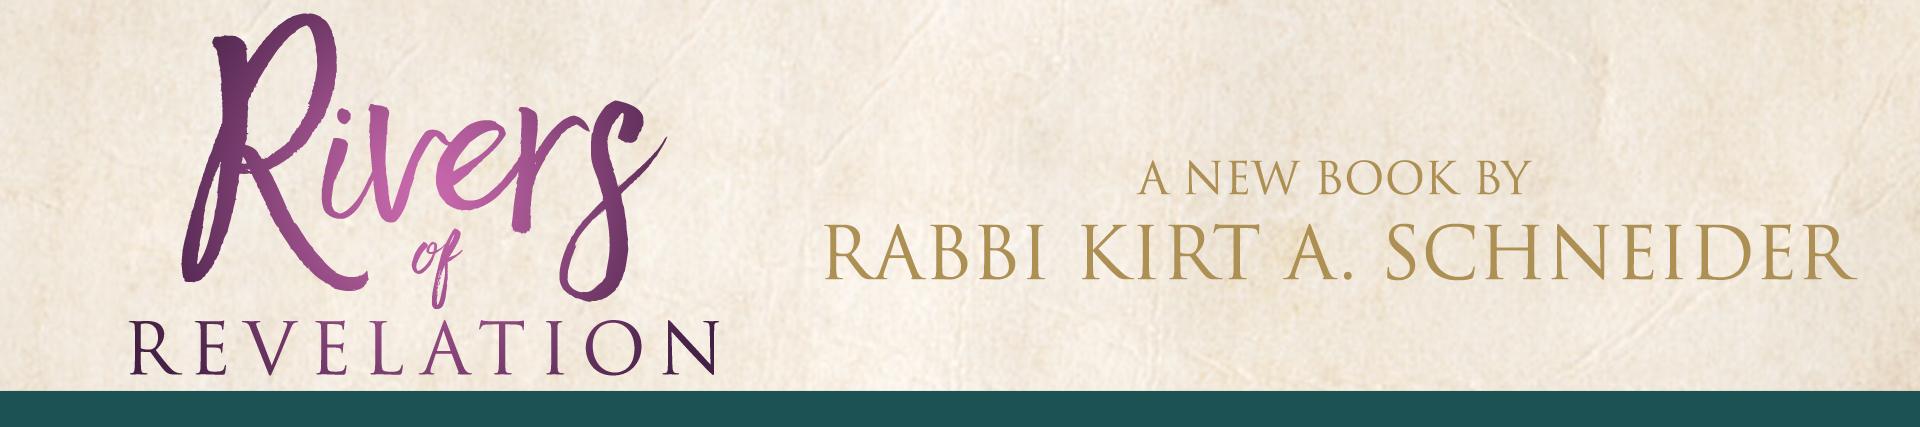 Rivers of Revelation Book by Rabbi Kurt Schneider